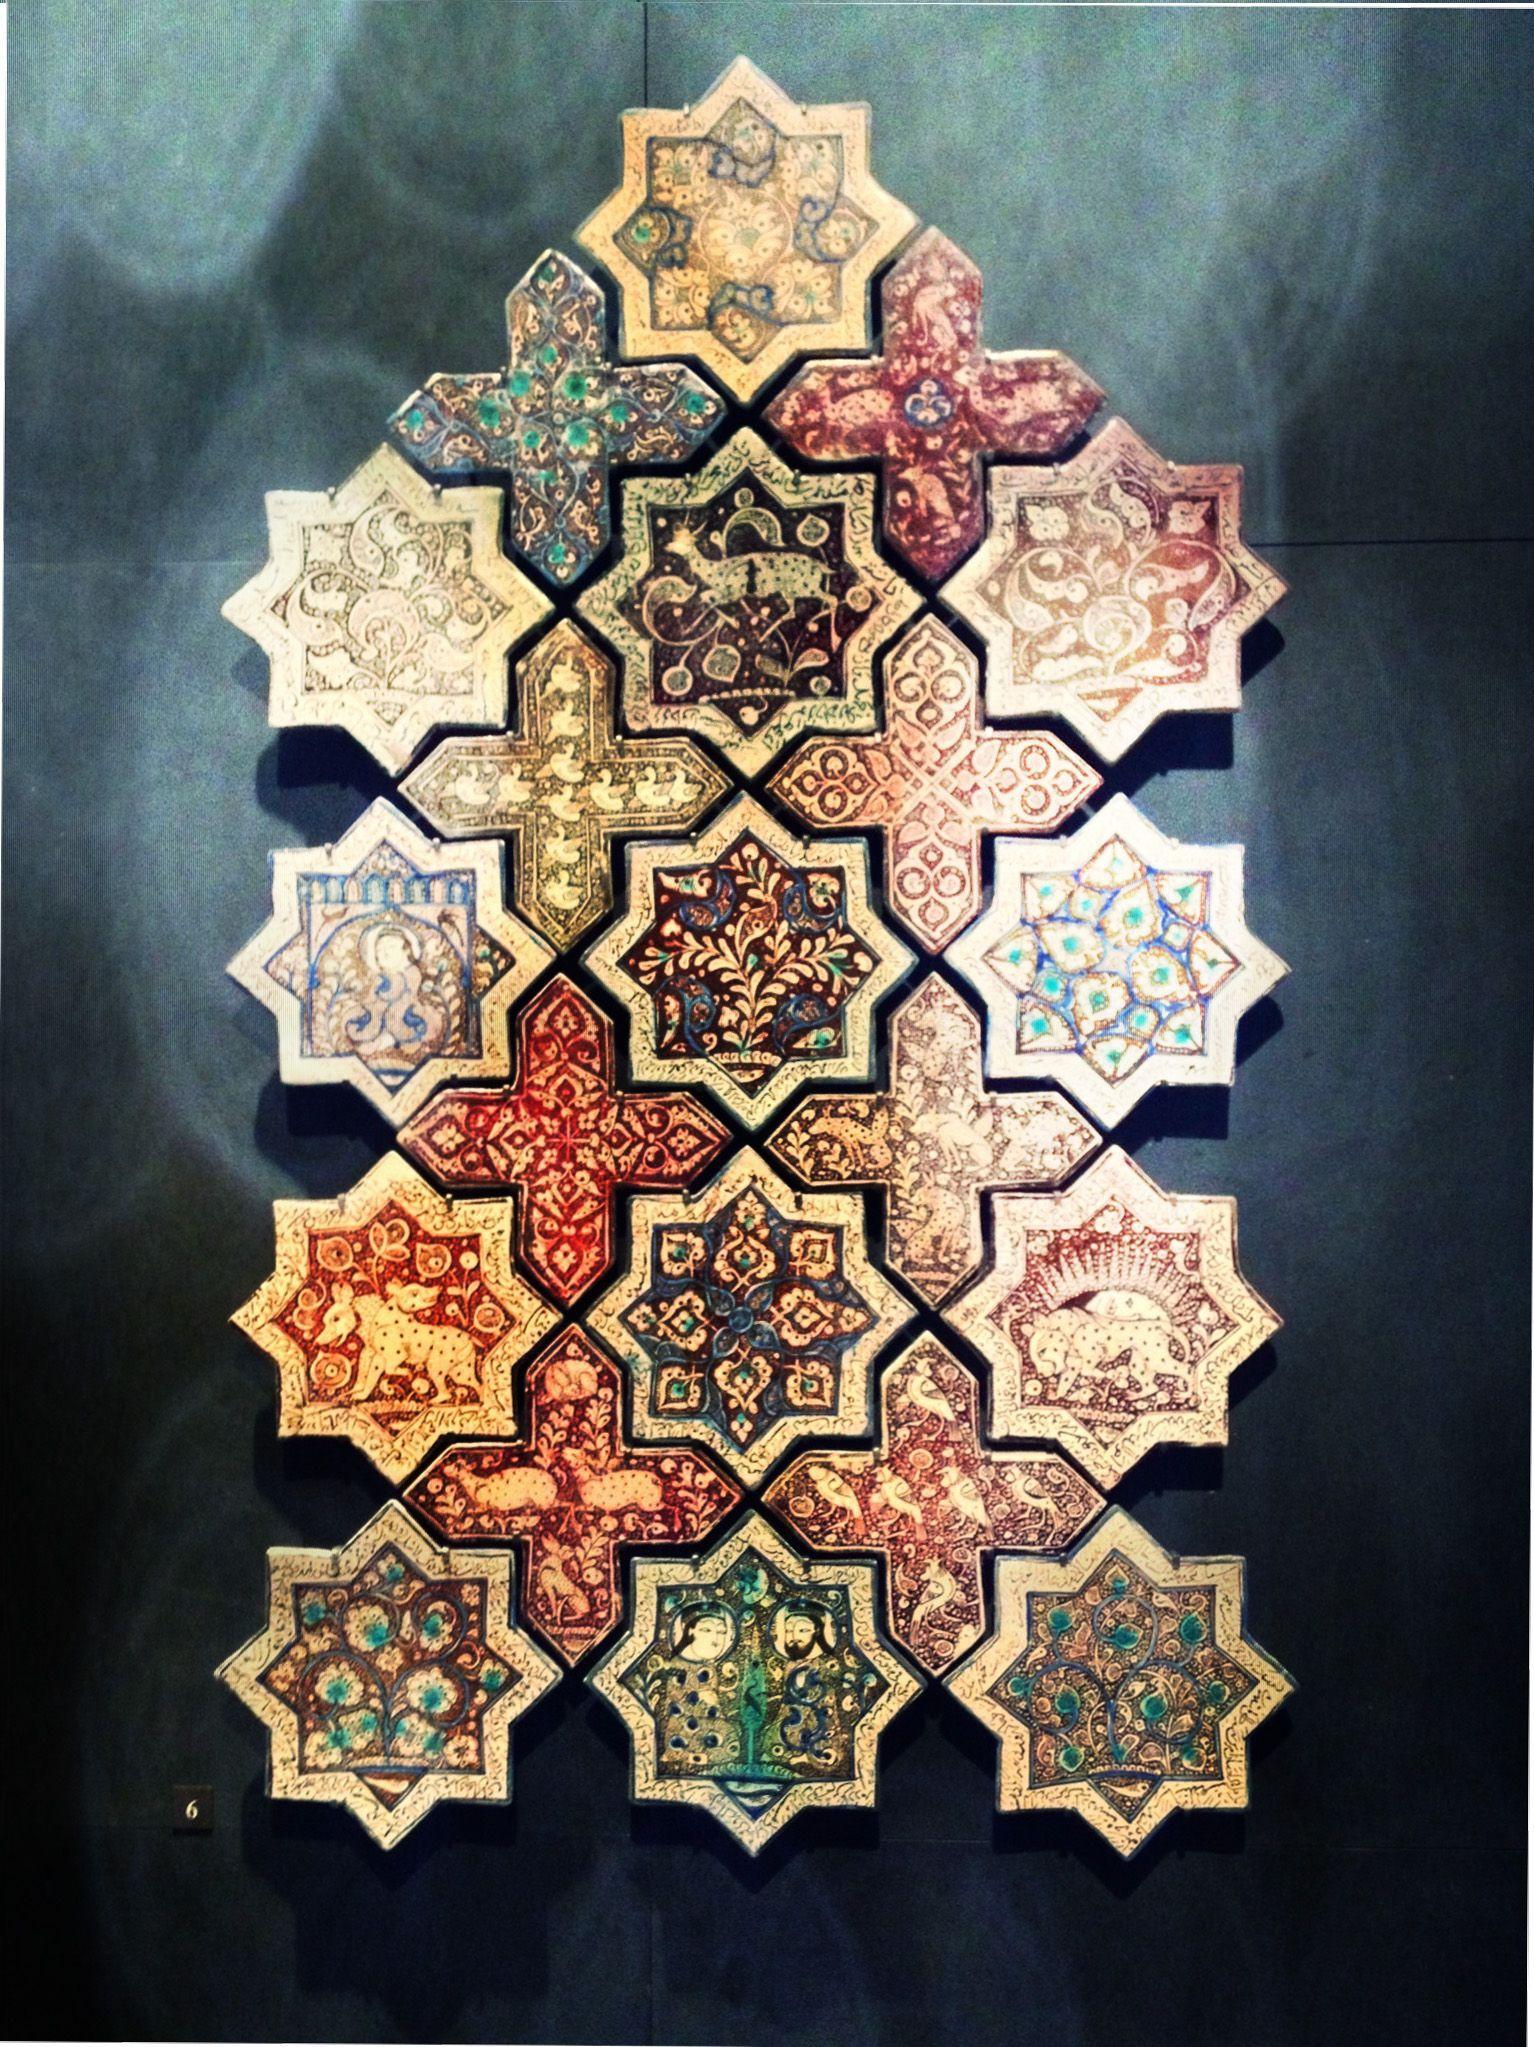 Arab Art Wallpapers Top Free Arab Art Backgrounds Wallpaperaccess